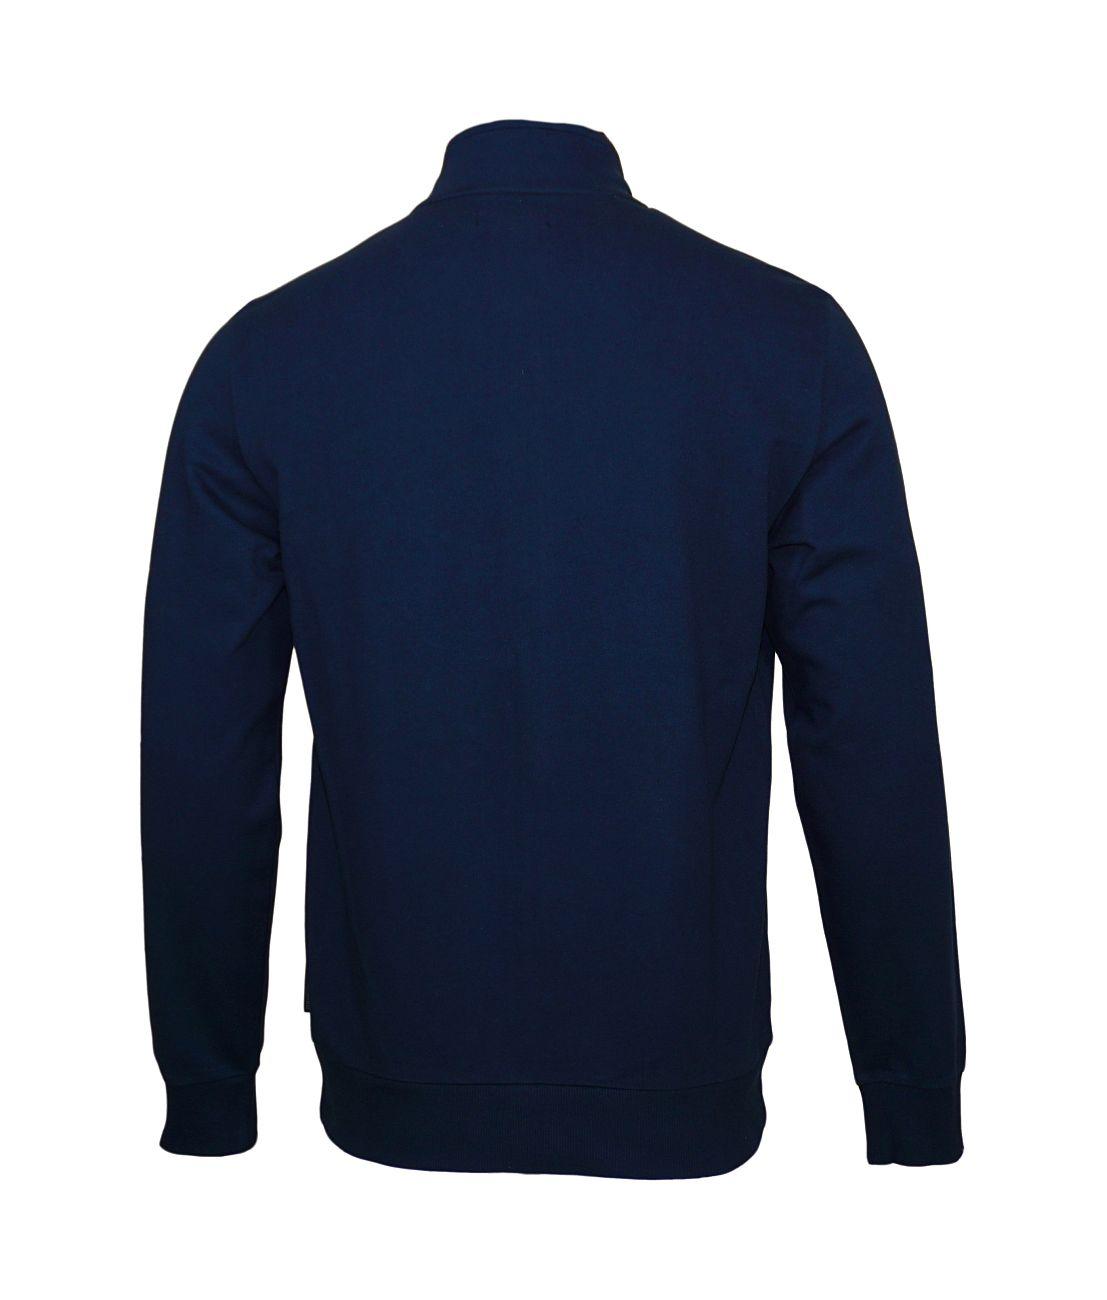 Emporio Armani Jacke Sweater Zip 111532 8P571 00135 MARINE F18-EAJ1